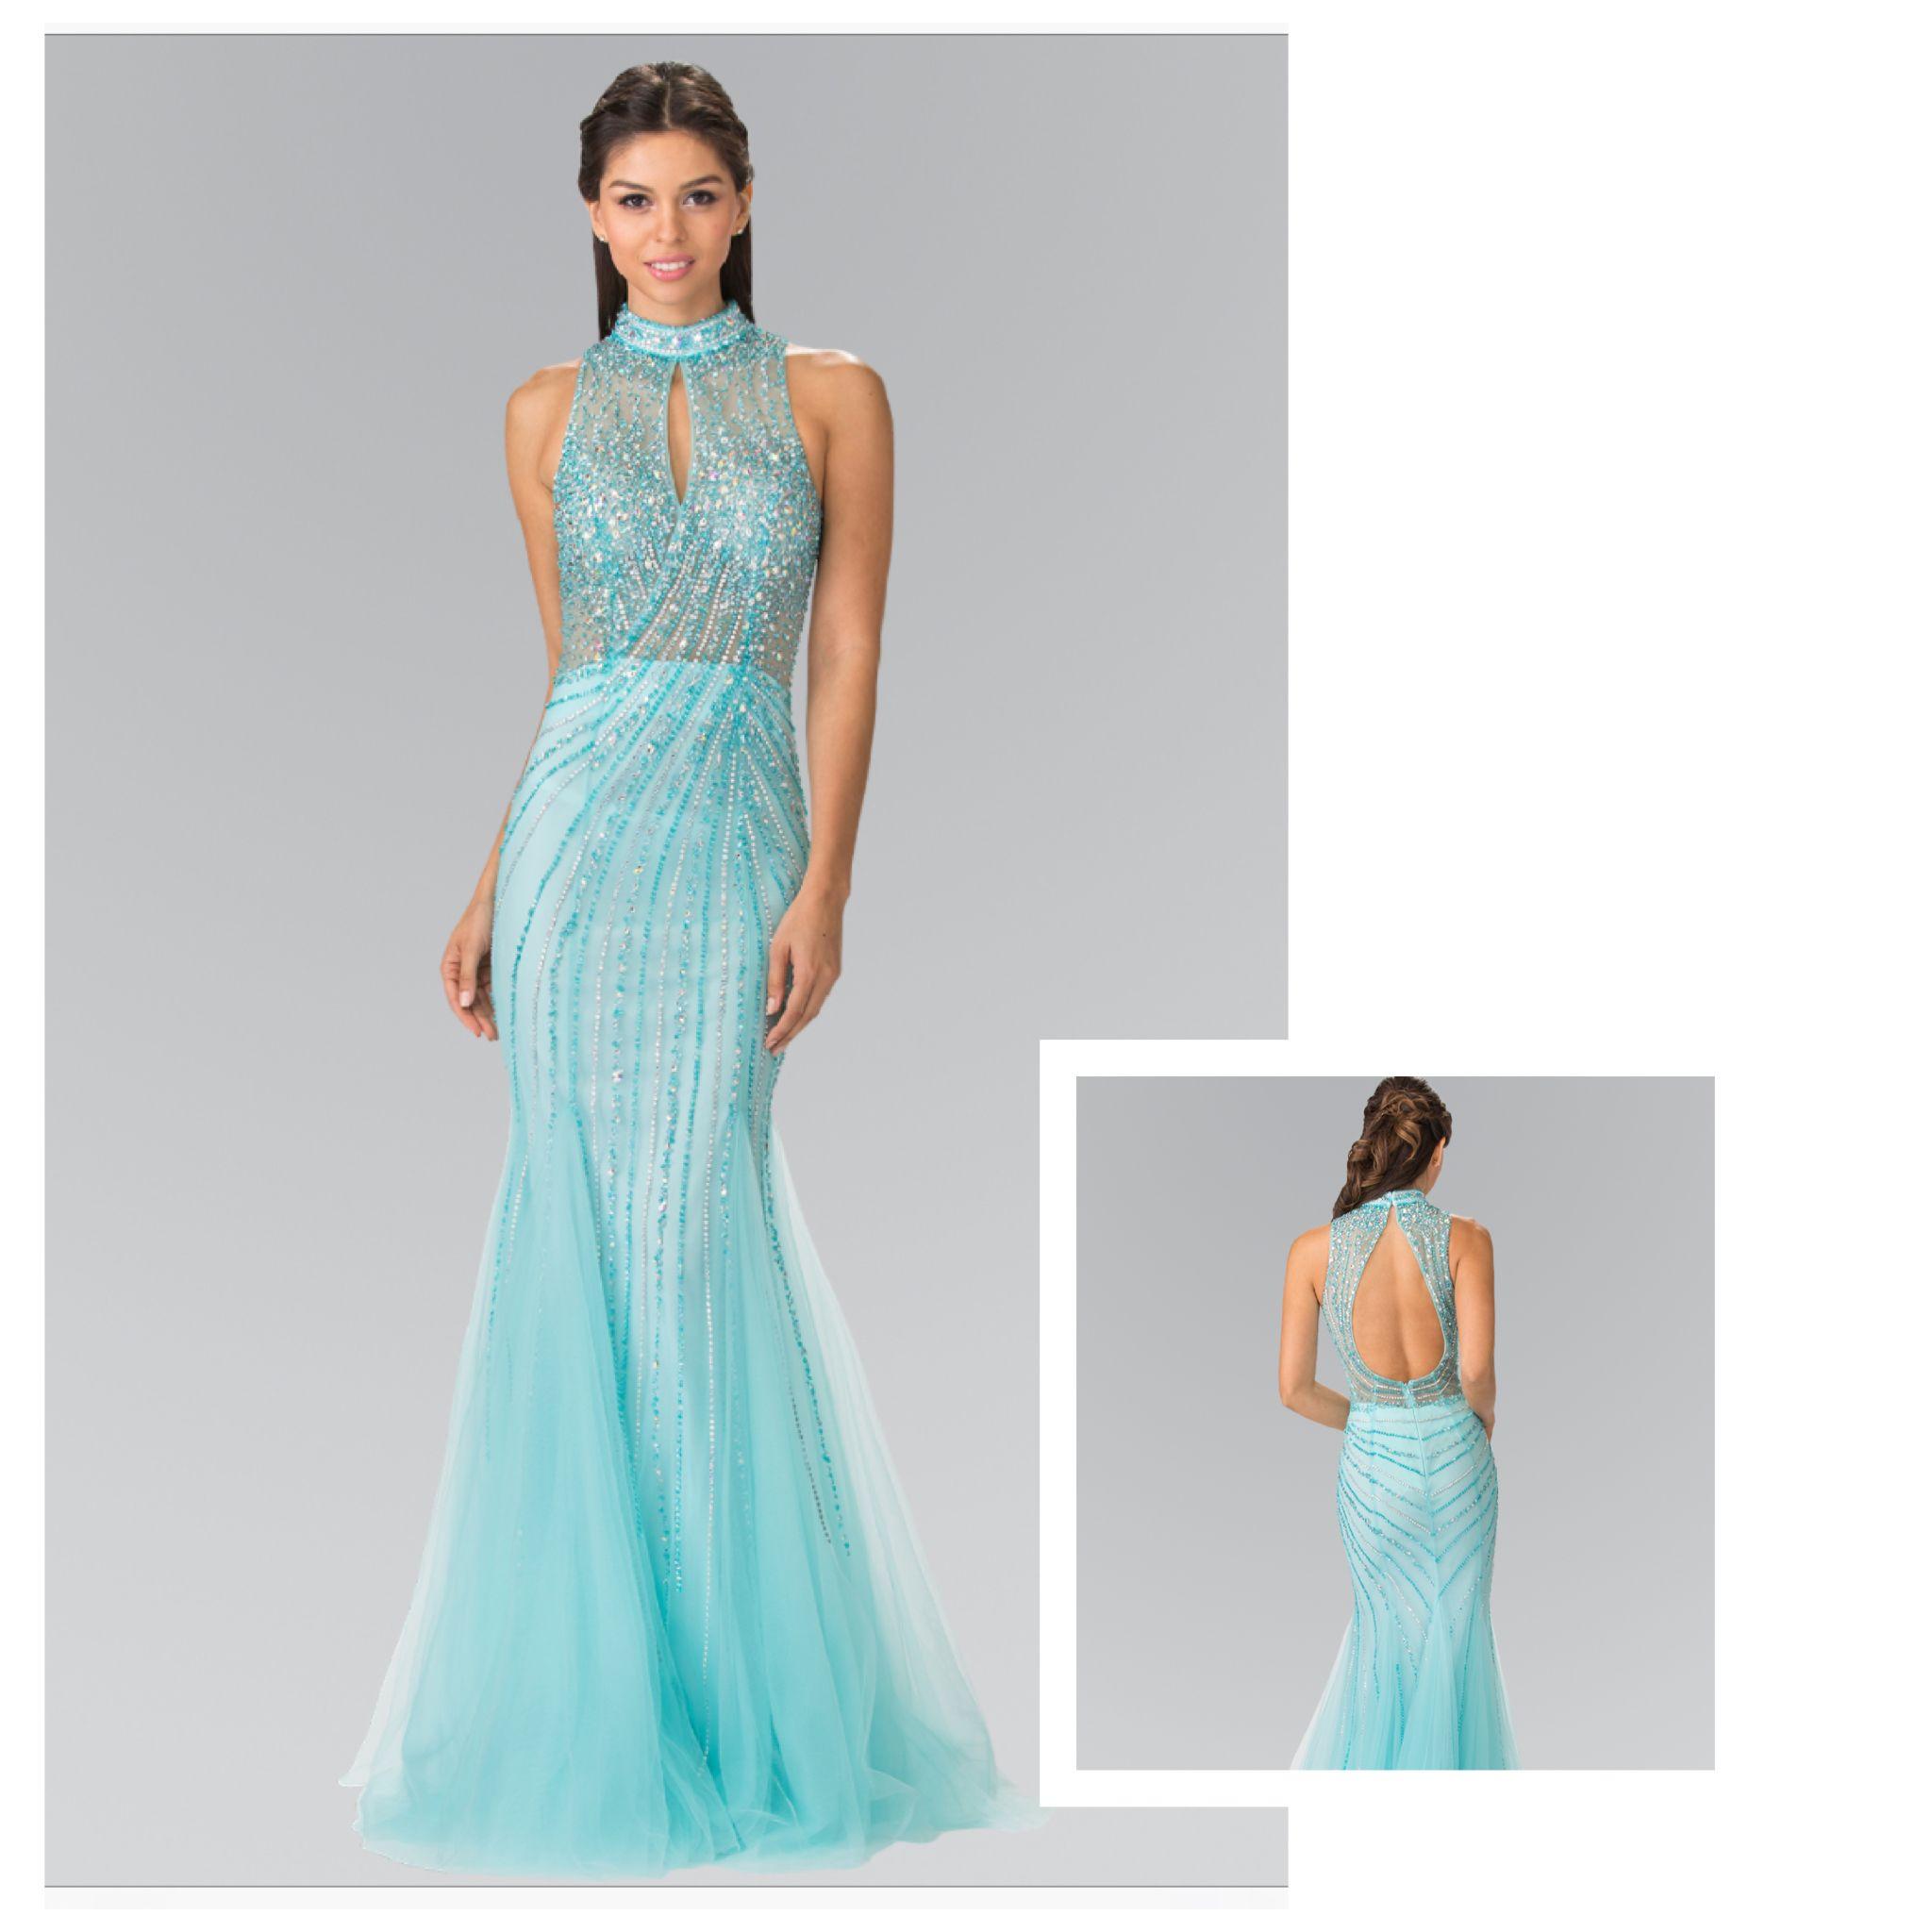 92c9f596 Ladies are meant to SpaRKle!! ✨ Aqua Glitter Prom Dress | Prom 2017 ...